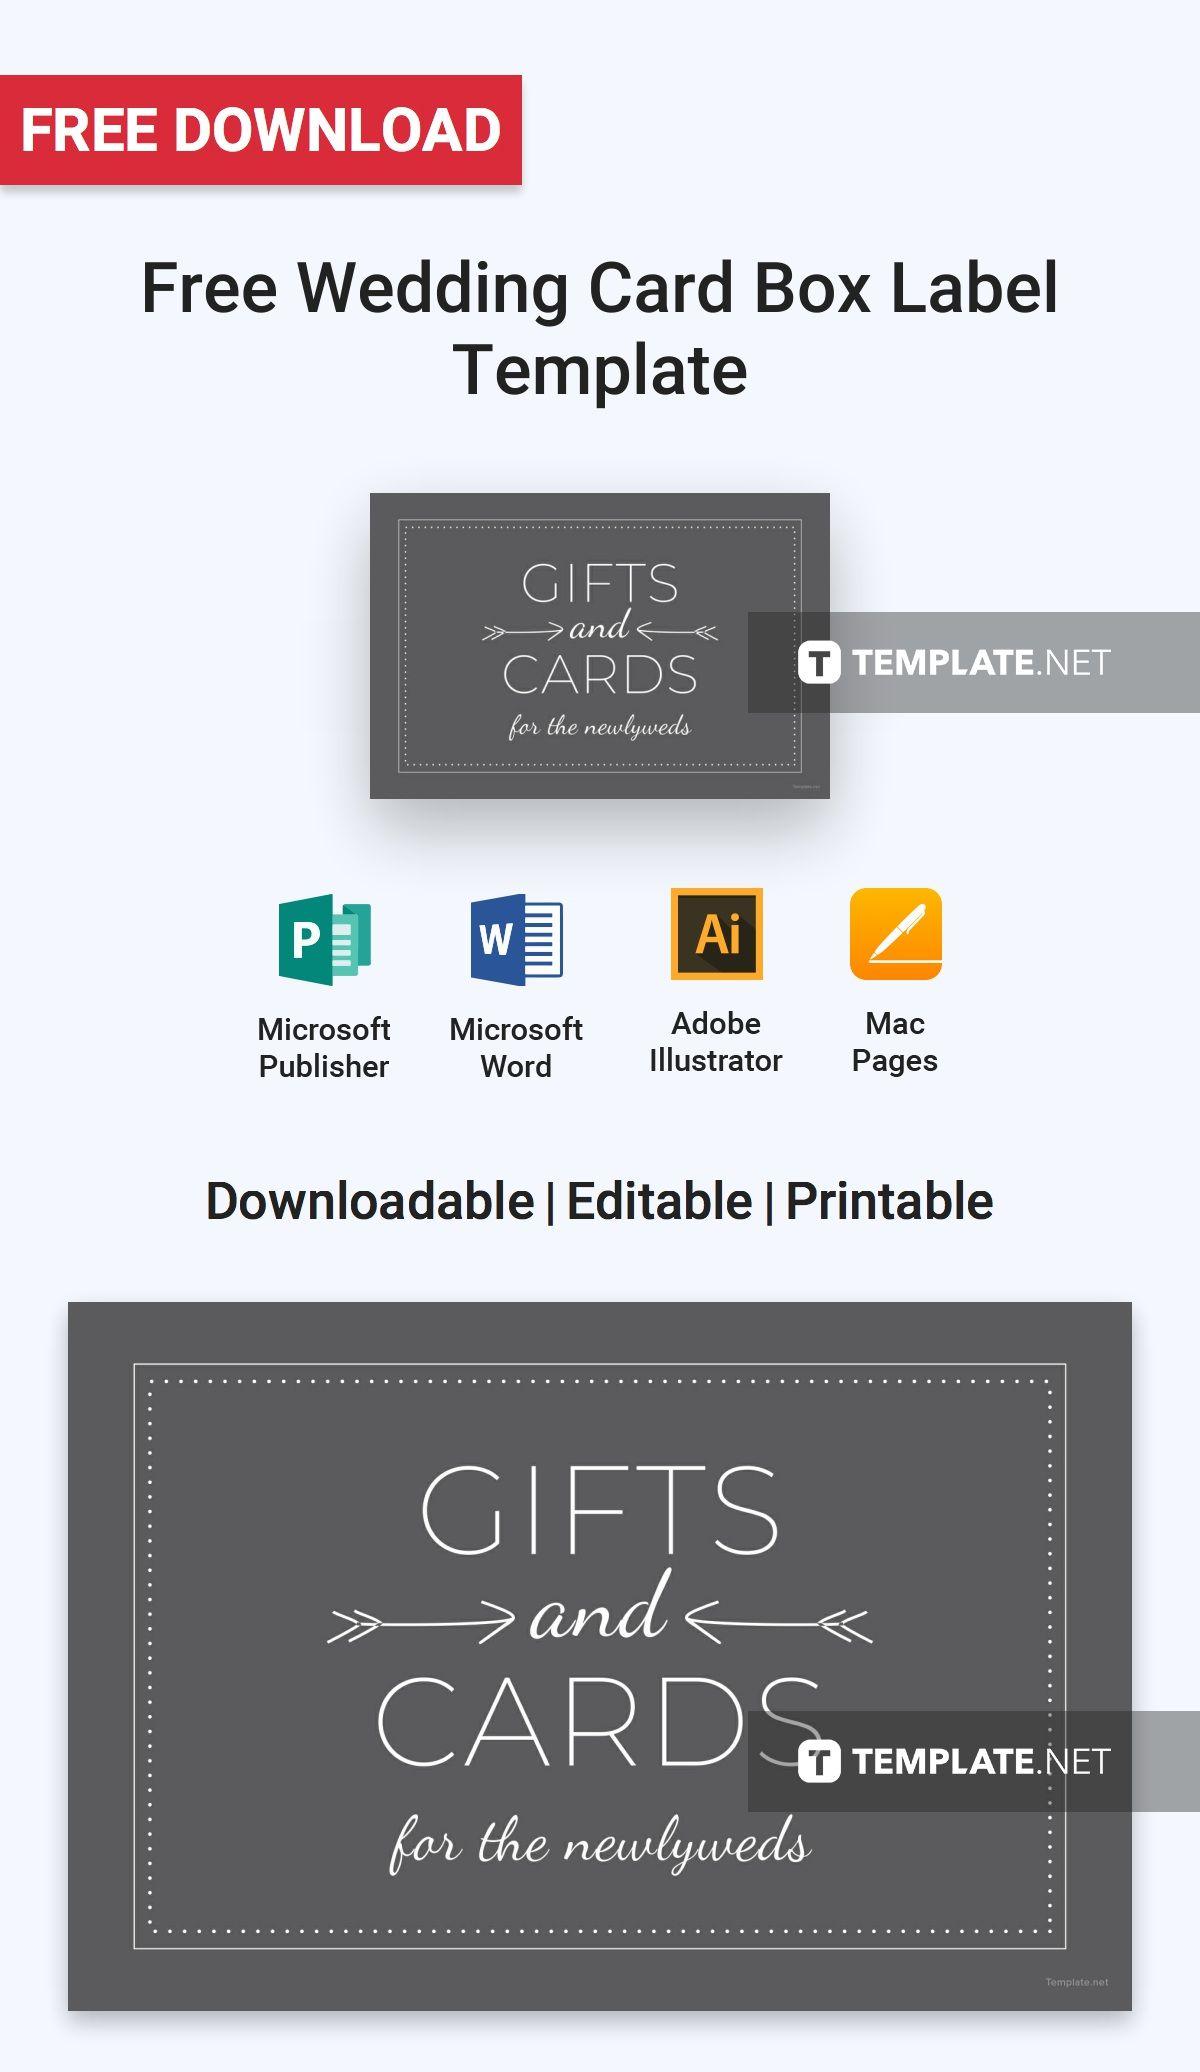 free wedding card box label label templates designs 2019